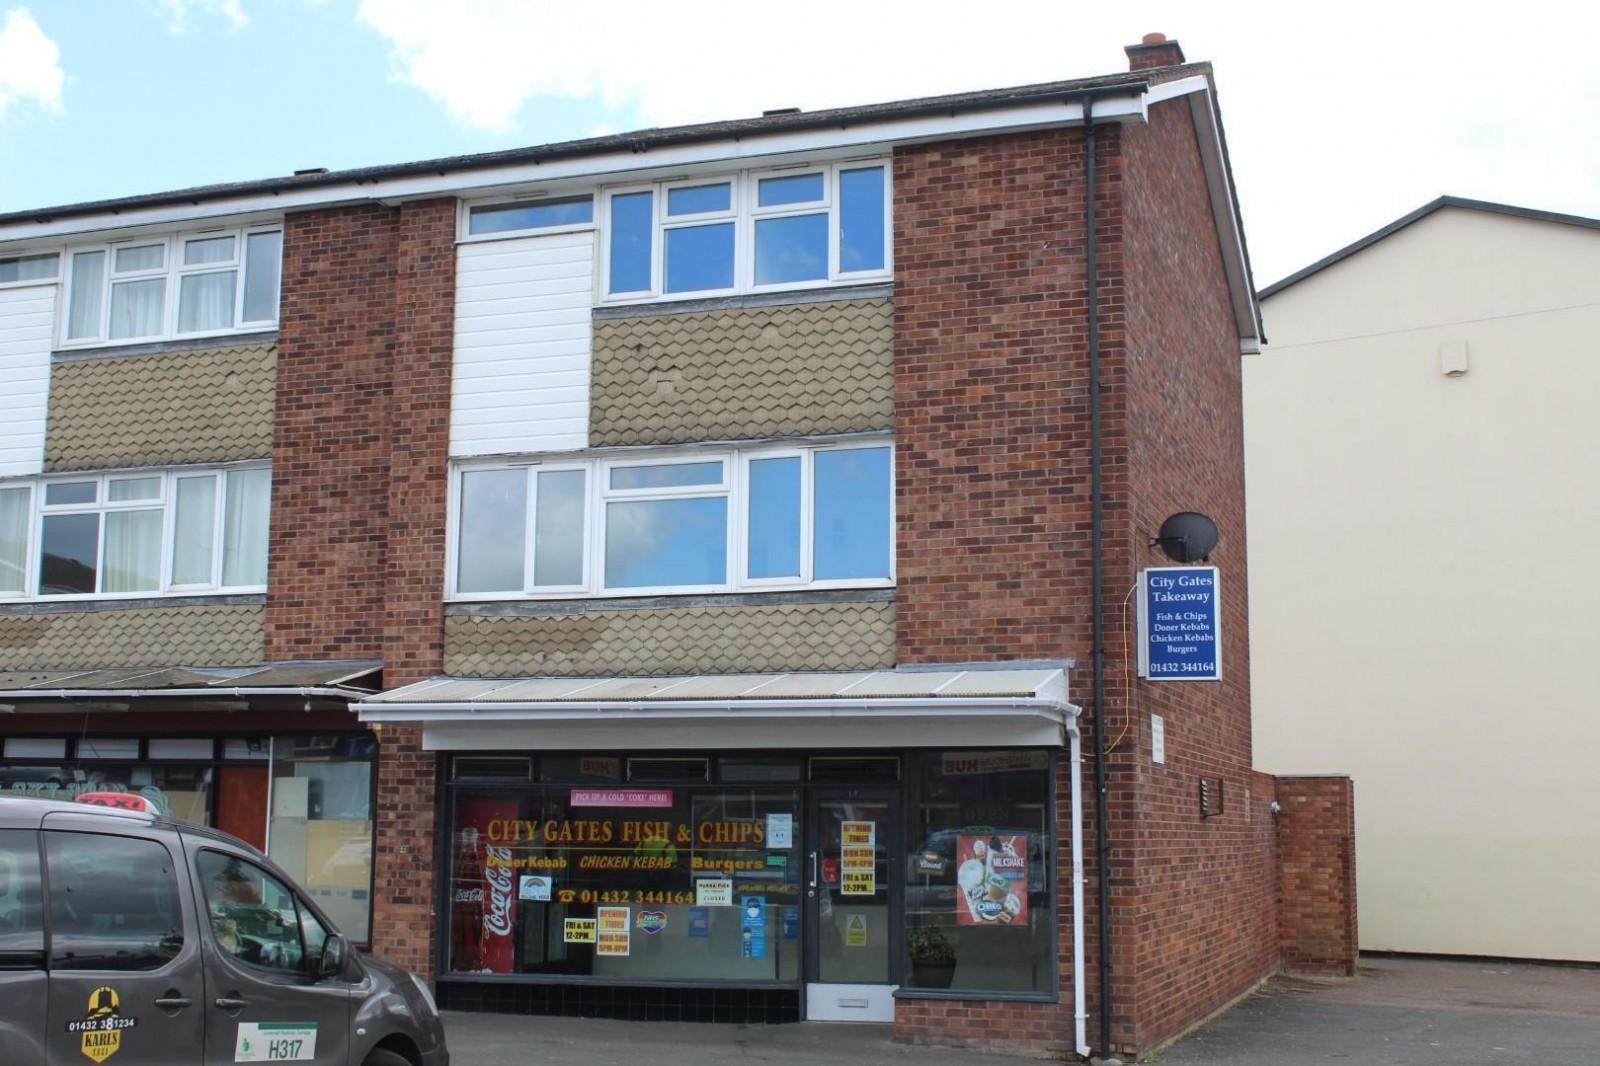 18 Chilton Square, Tupsley, Hereford